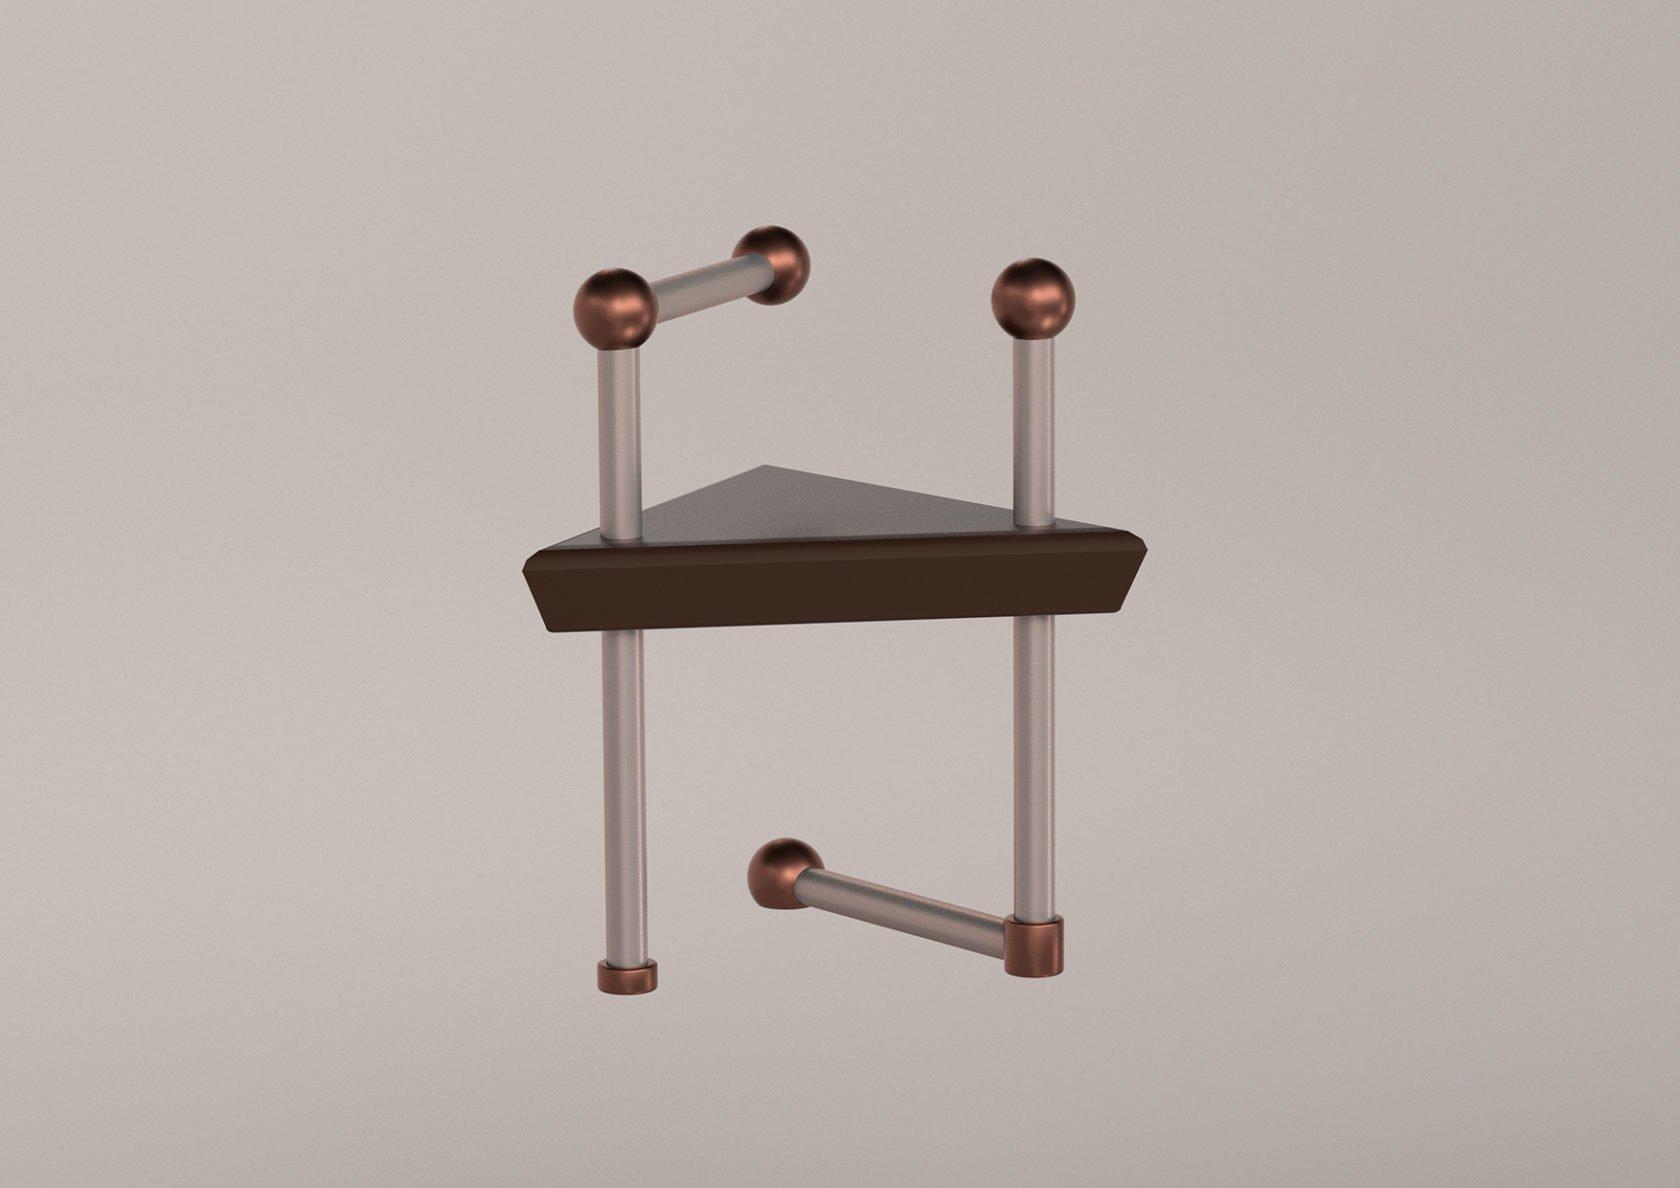 Murad-design-studio-designagentur-murad-ghanaimy-design-werbung-kreativ-kupfer-stuhl-produktdesign